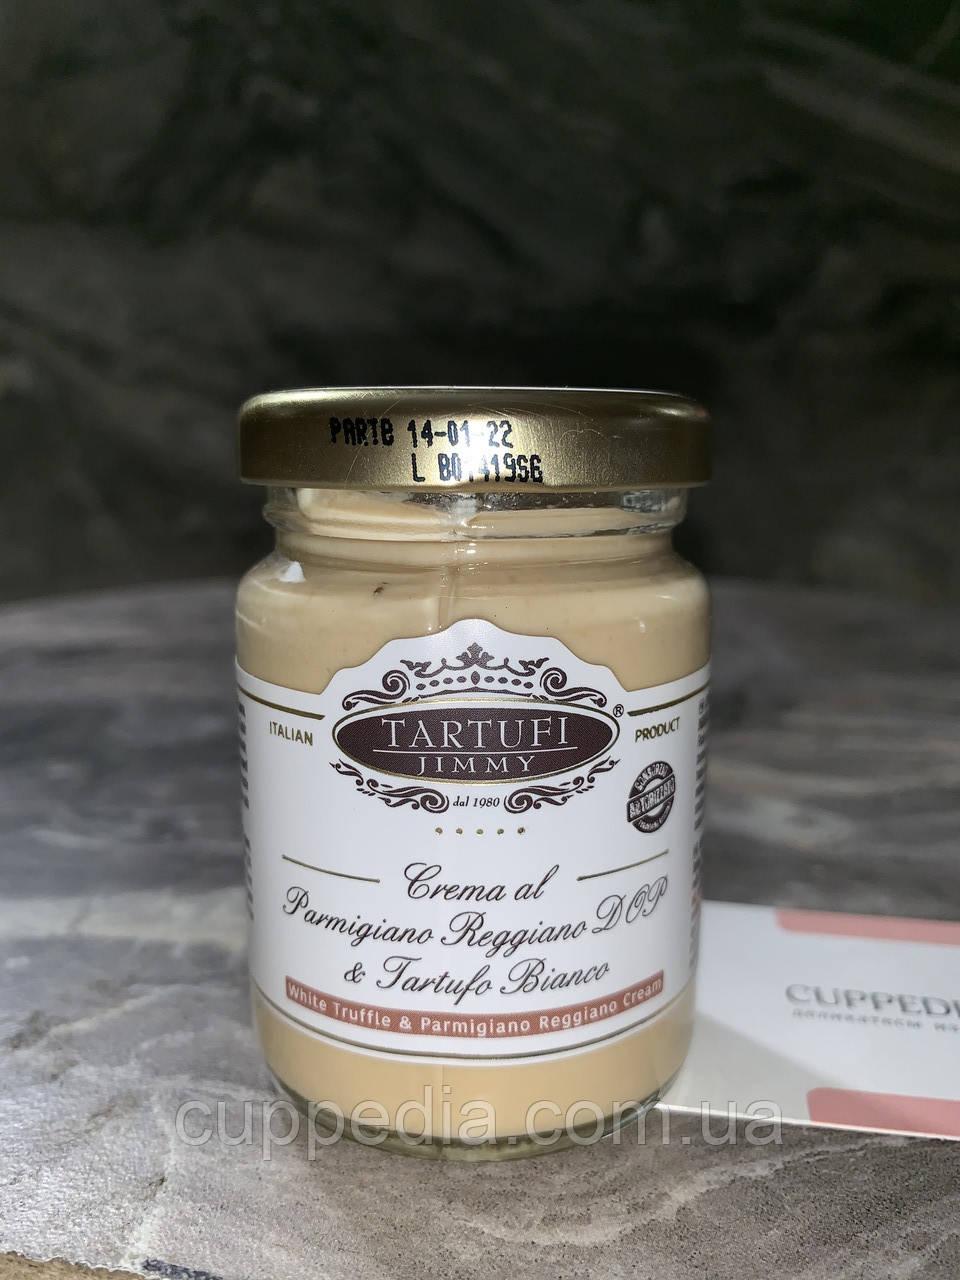 Паста з білим трюфелем Tartufi Jimmy Crema al Parmigiano Reggiano DOP & Tartufo Bianco